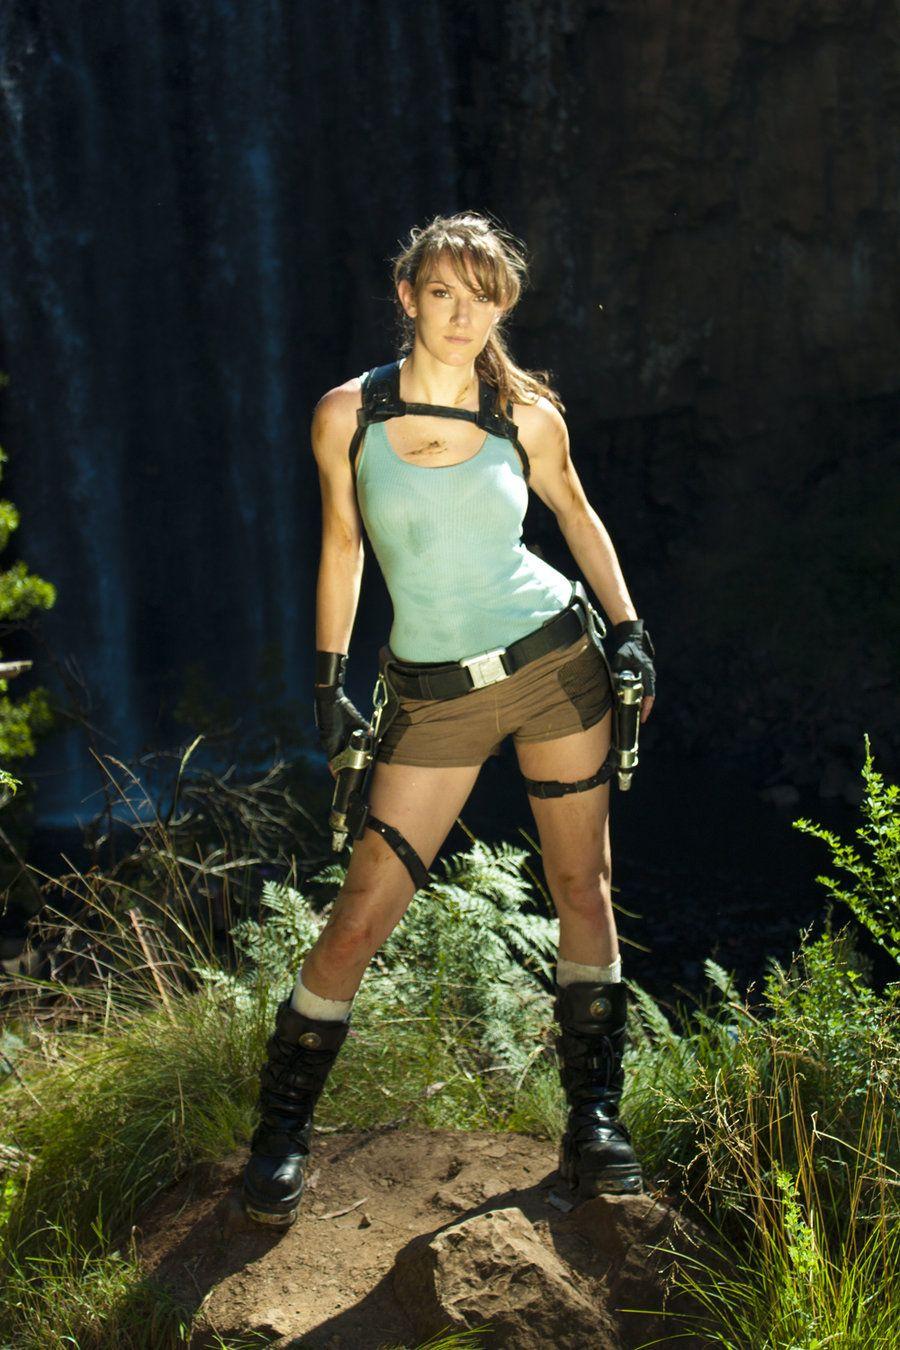 Lara Croft, women, cosplay, model, JennCroft, girls with